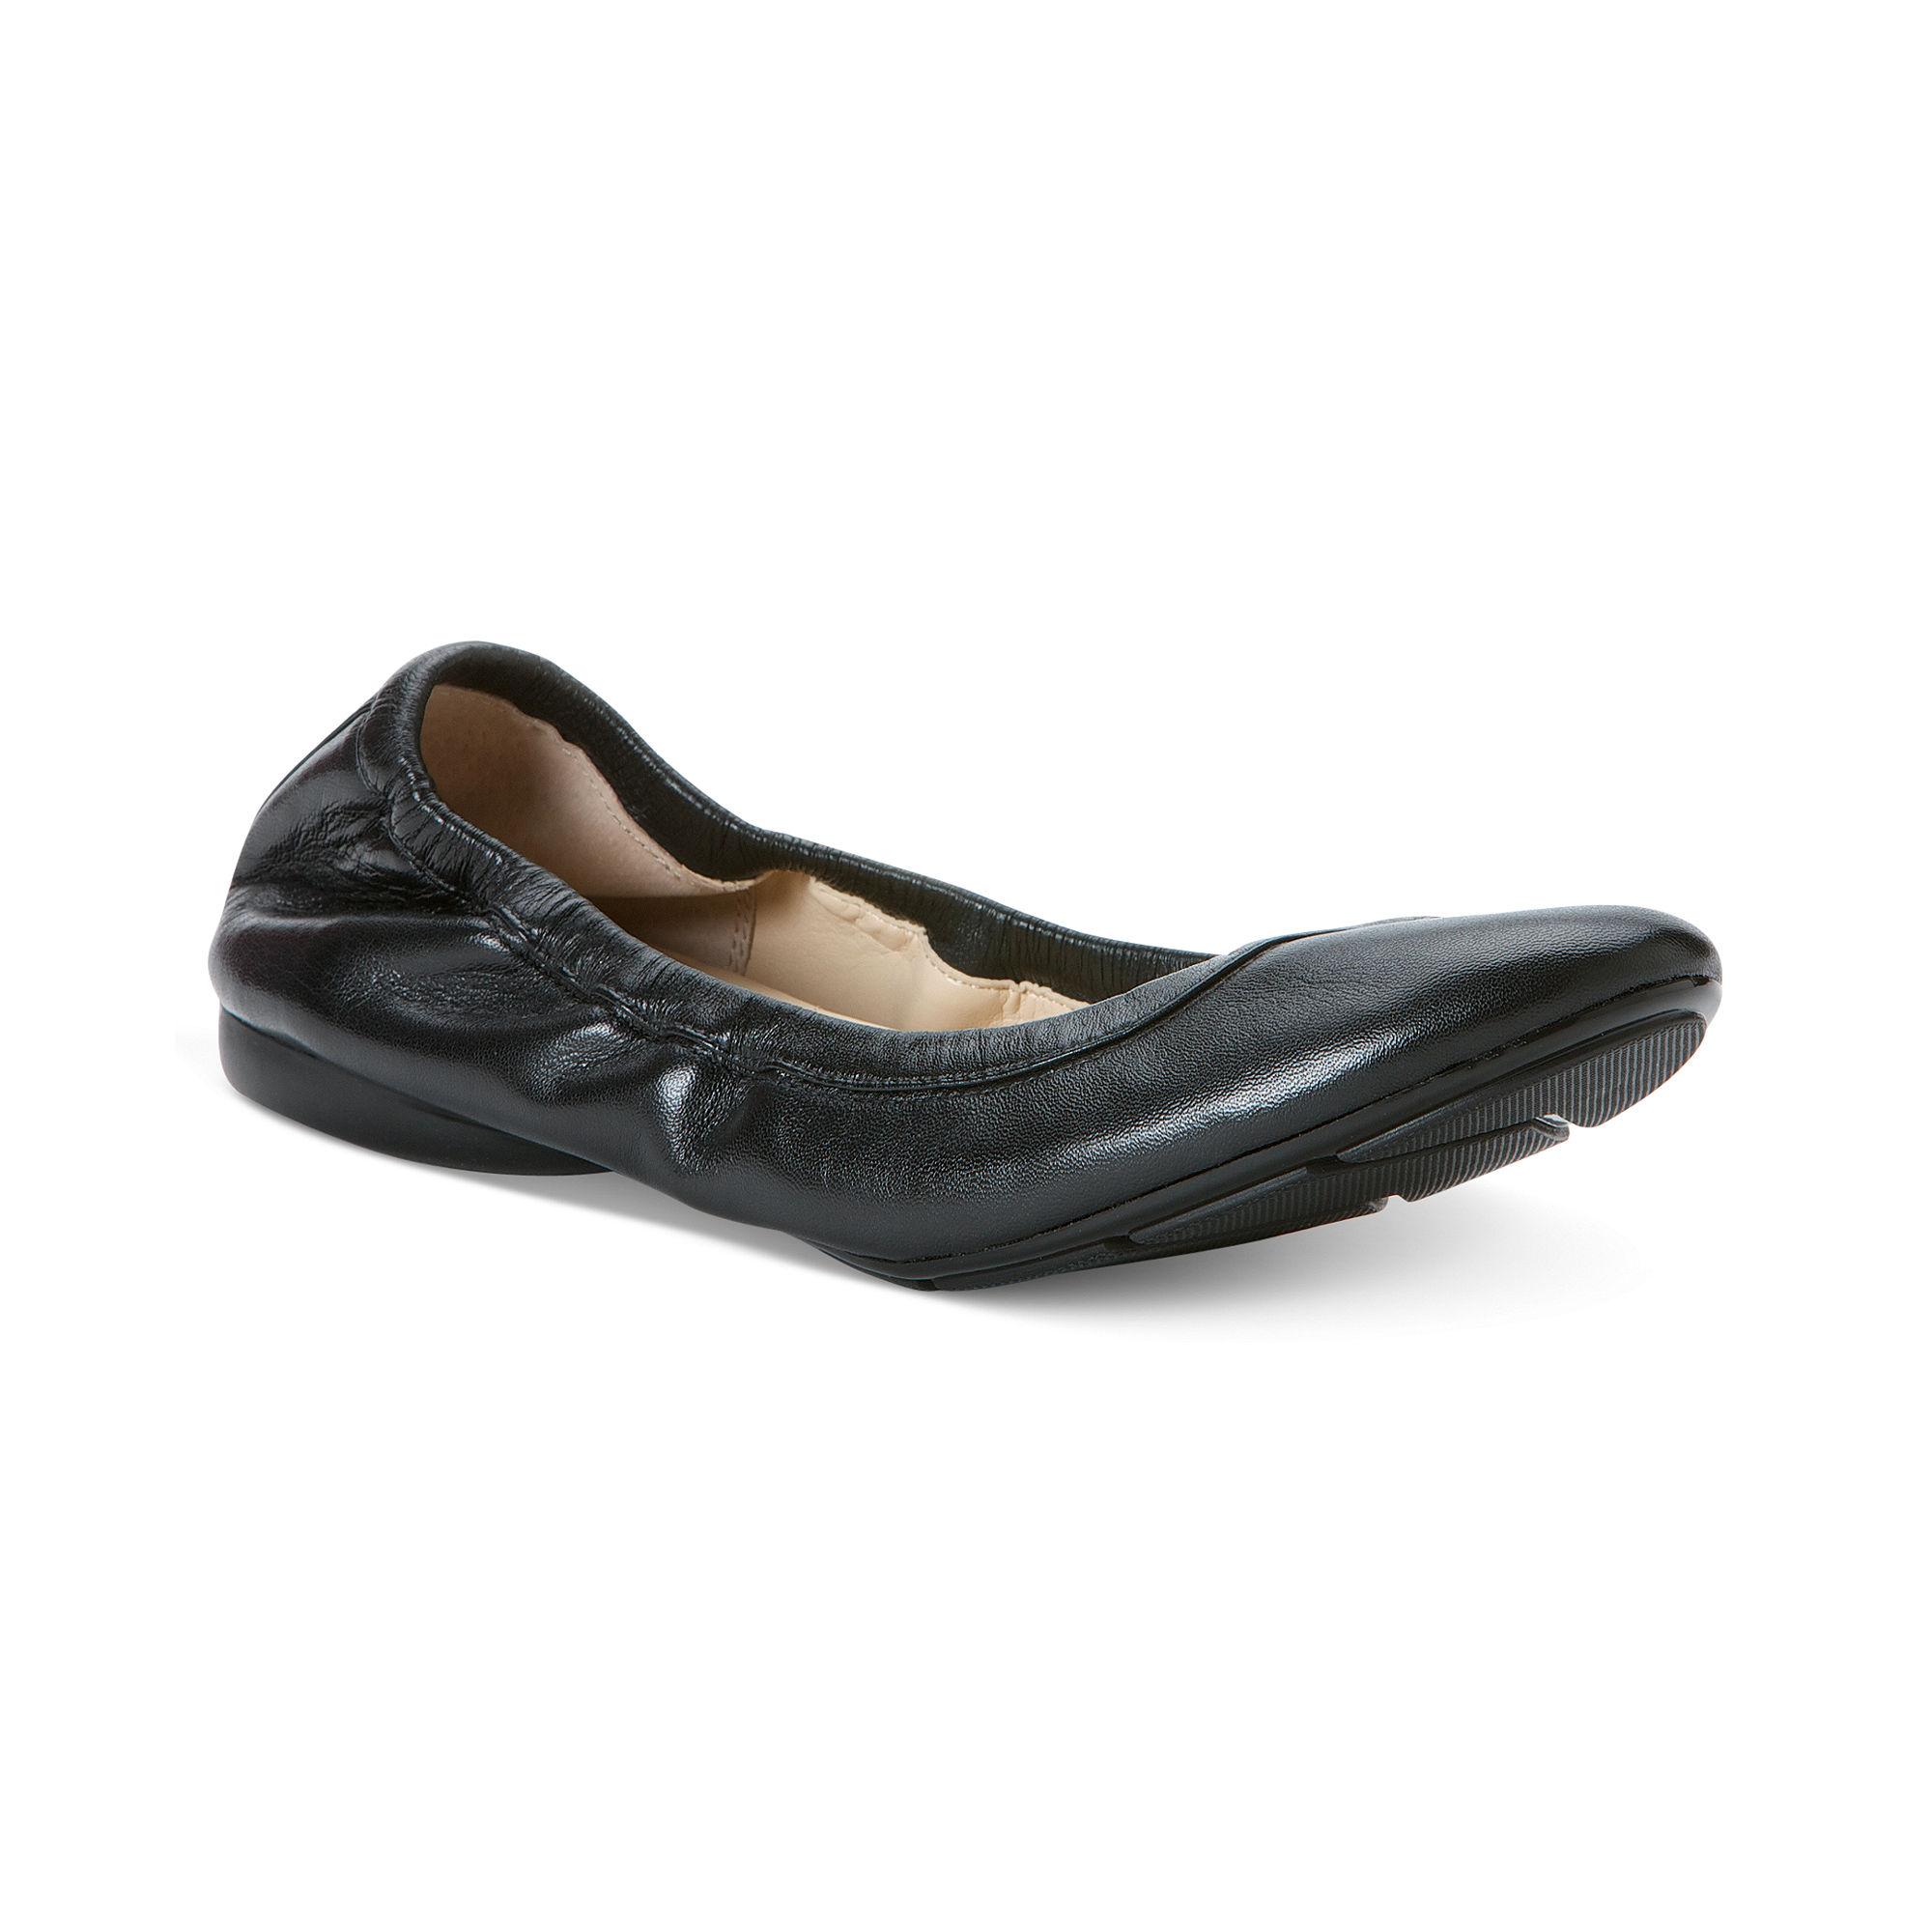 37a47eb855d4 Calvin Klein Prelia Ballet Flats in Black - Lyst